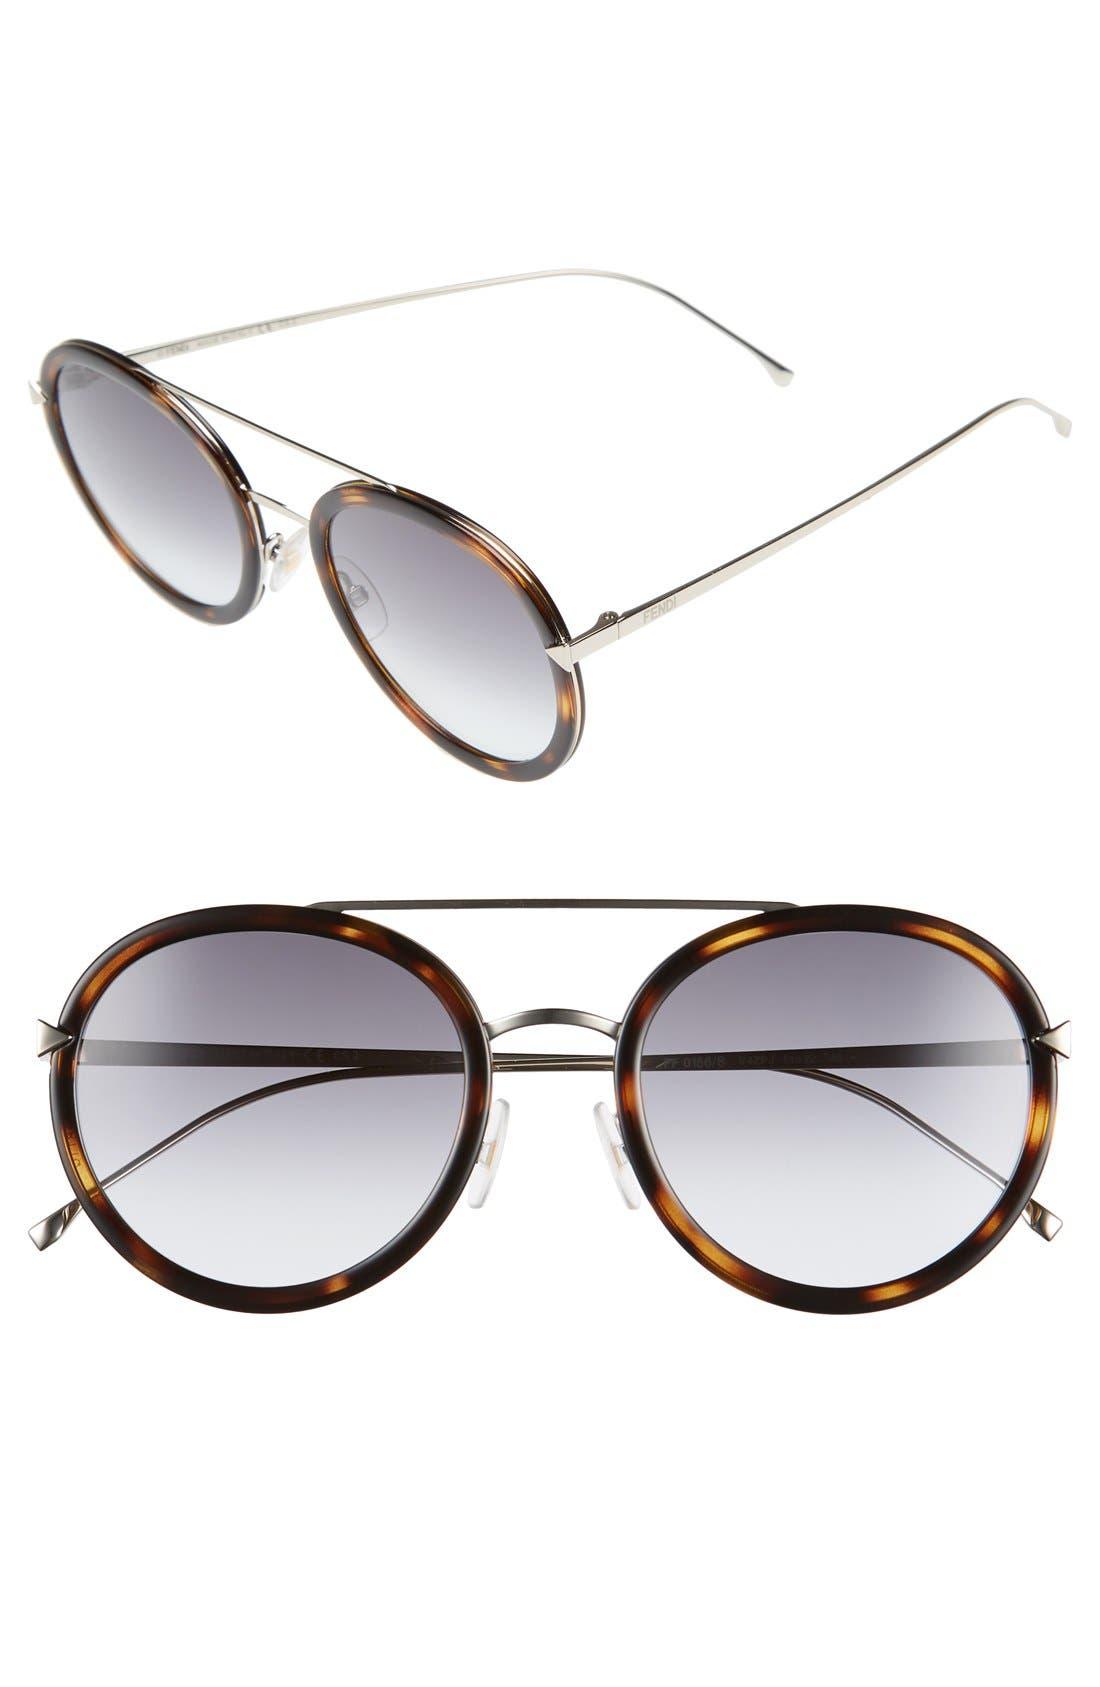 Alternate Image 1 Selected - Fendi 51mm Round Aviator Sunglasses